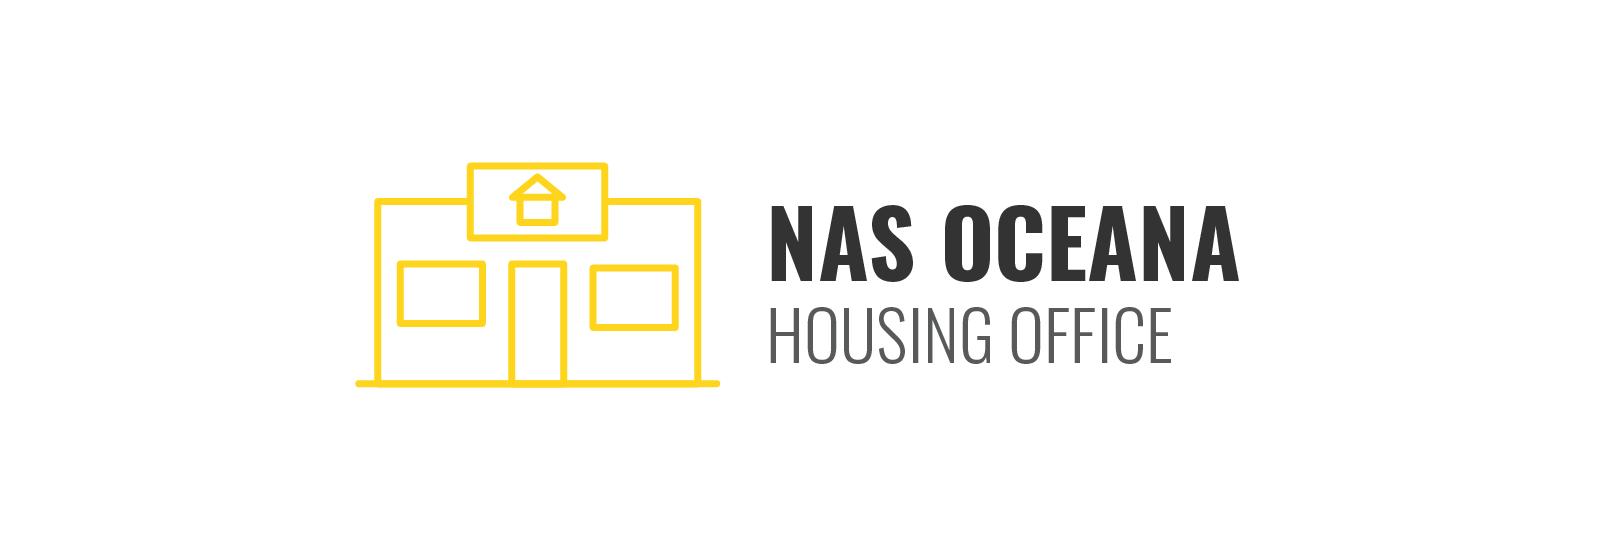 NAS Oceana Housing Office